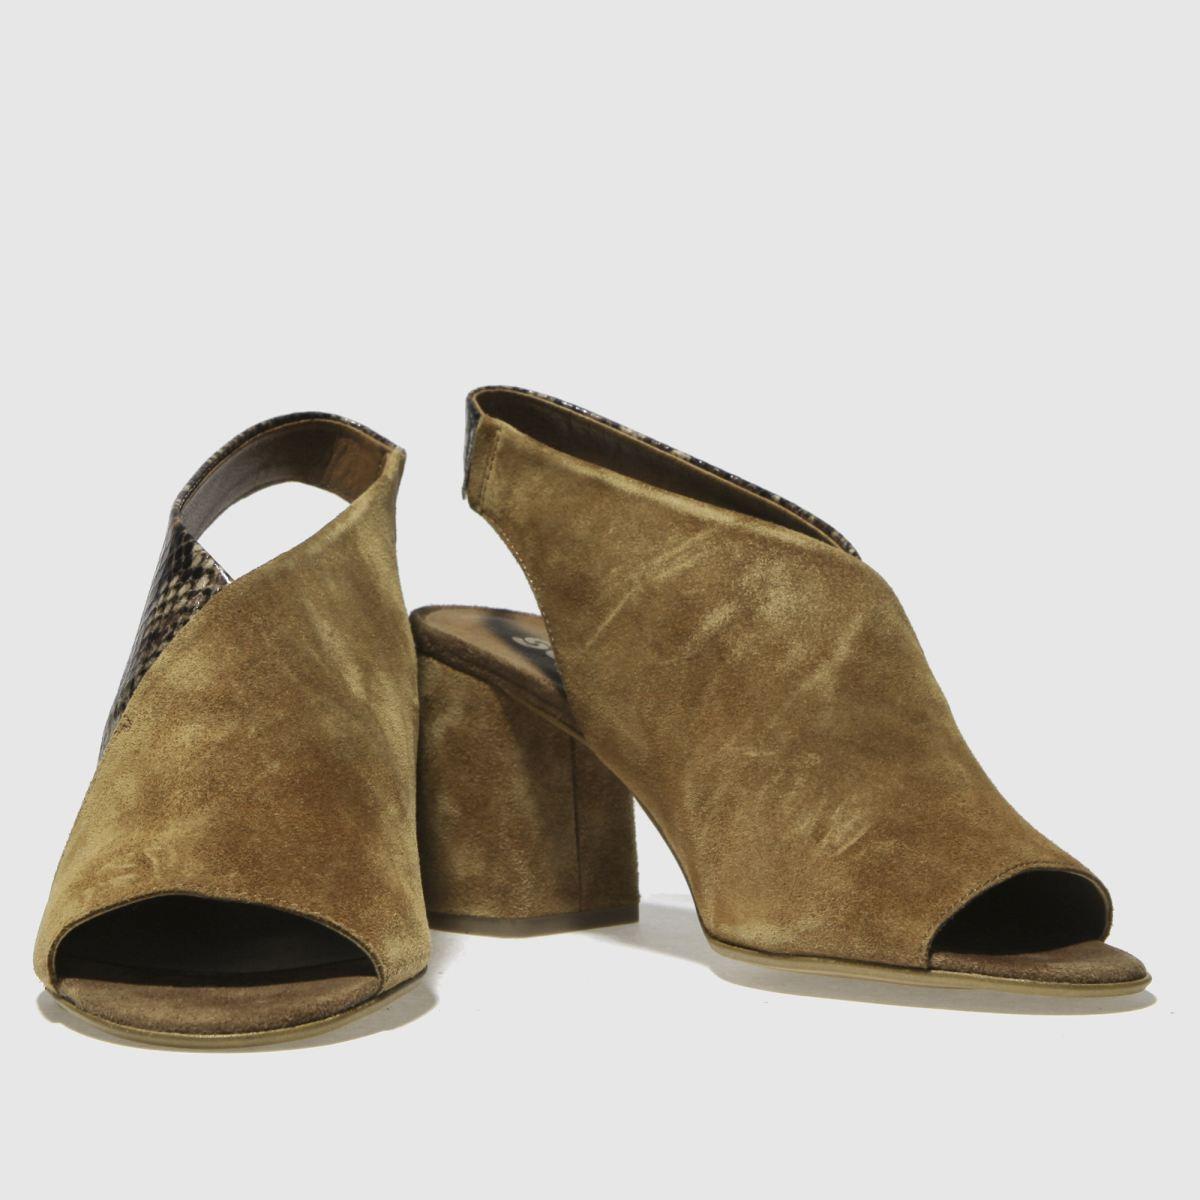 Damen Hellbraun schuh Allure Low Heels | schuh Gute Qualität beliebte Schuhe